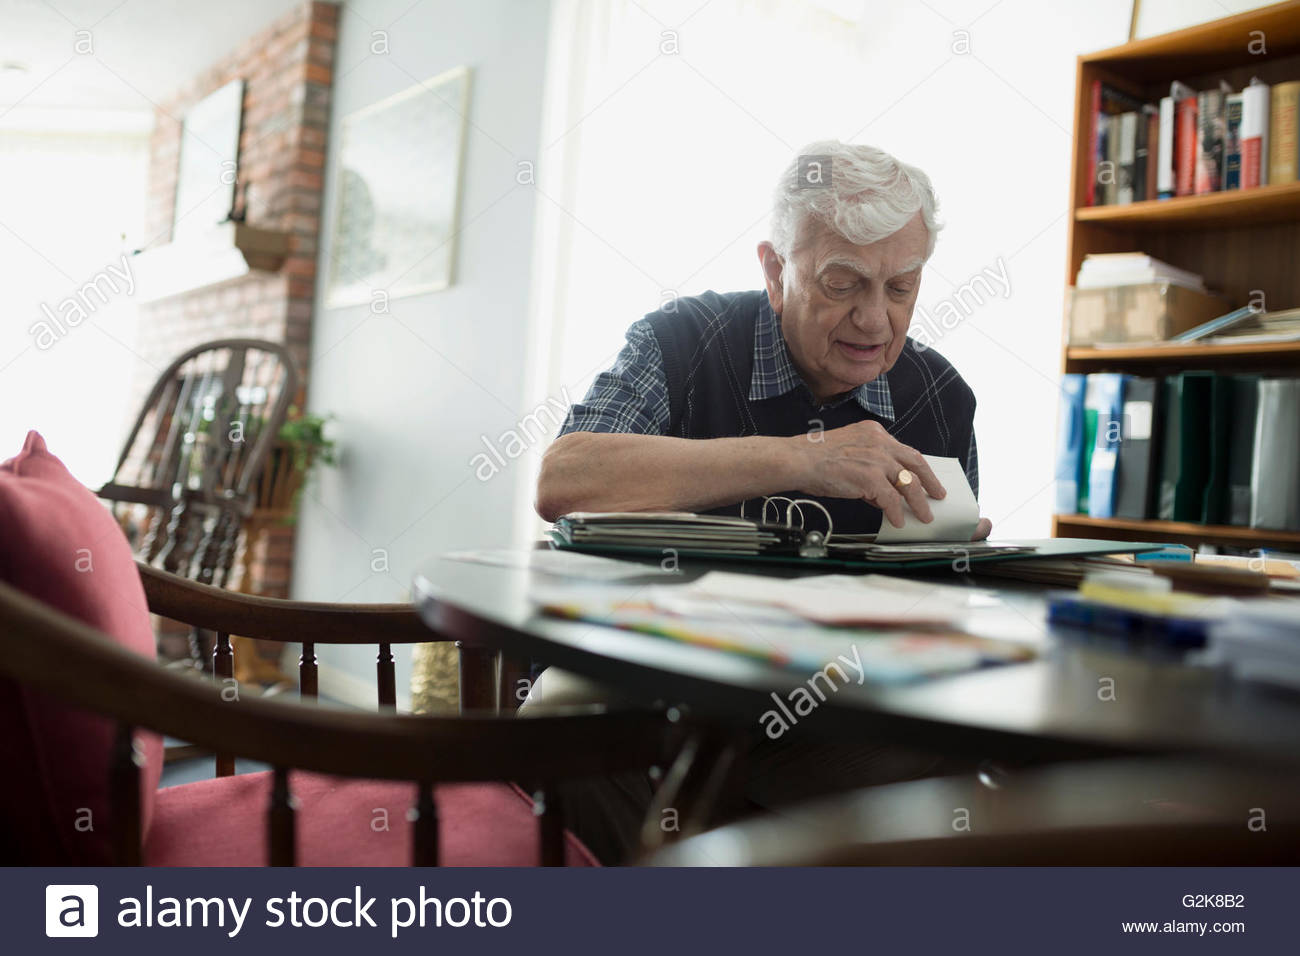 Senior man looking through photograph album - Stock Image